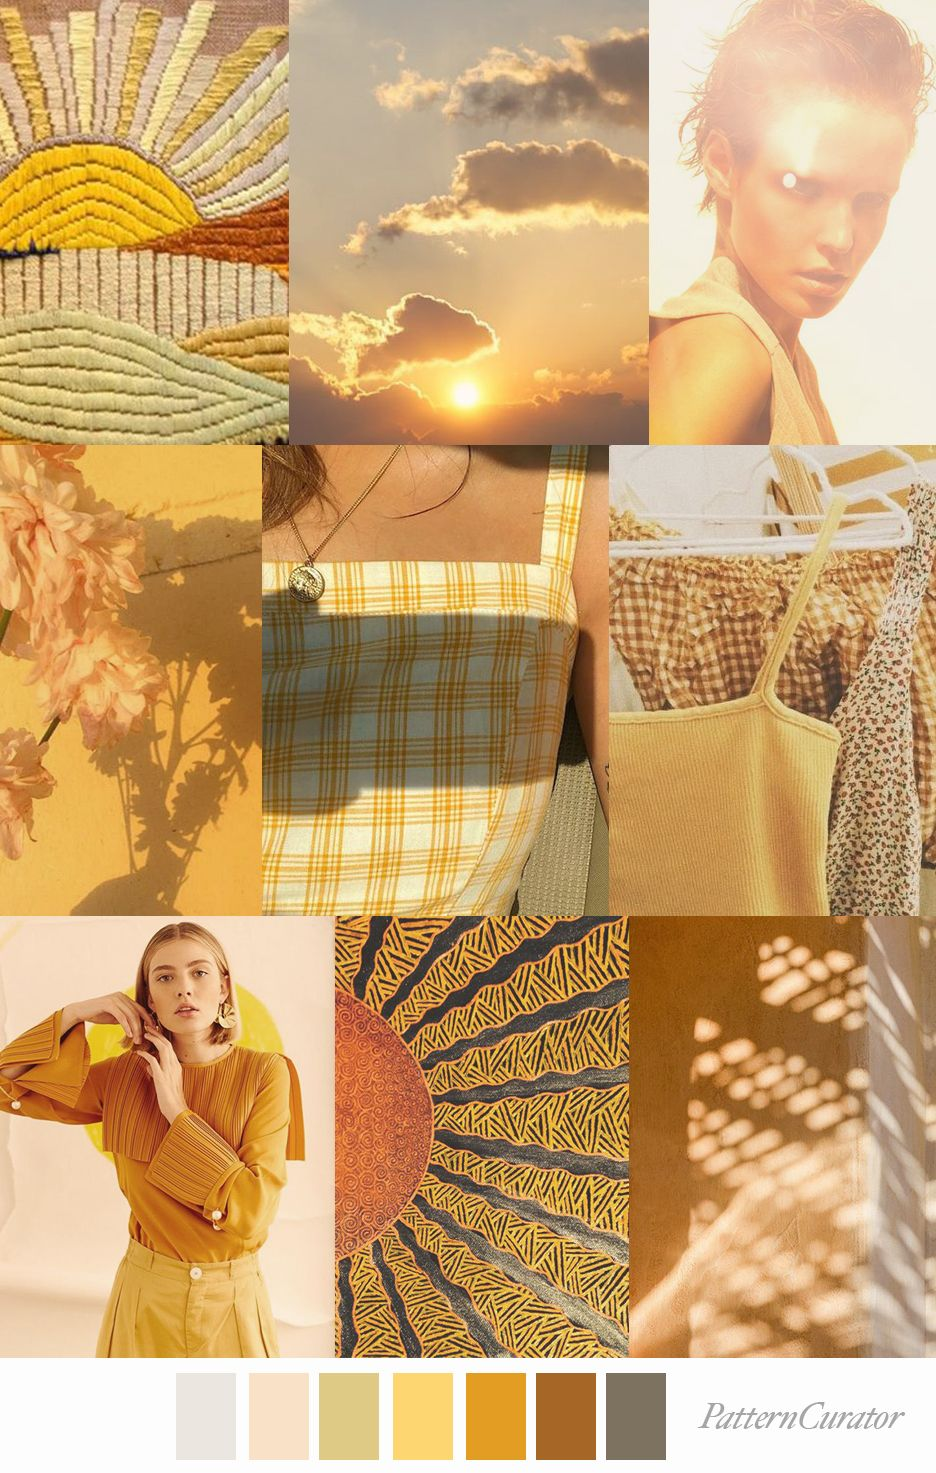 Pattern Curator SUN RAYS